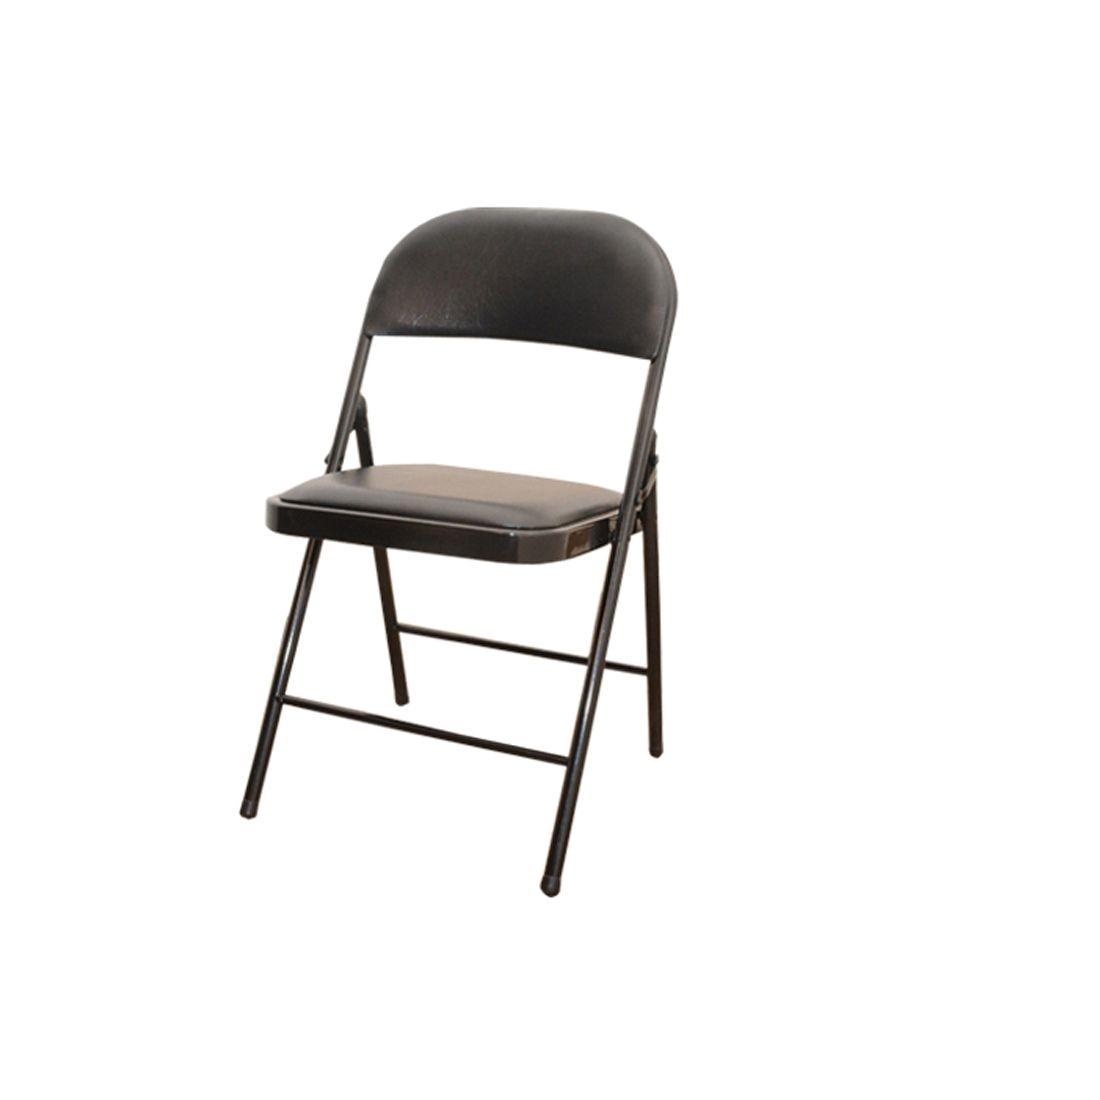 Soft Folding Chairs Eros Metal Folding Chair Buy Eros Metal Folding Chair Online at